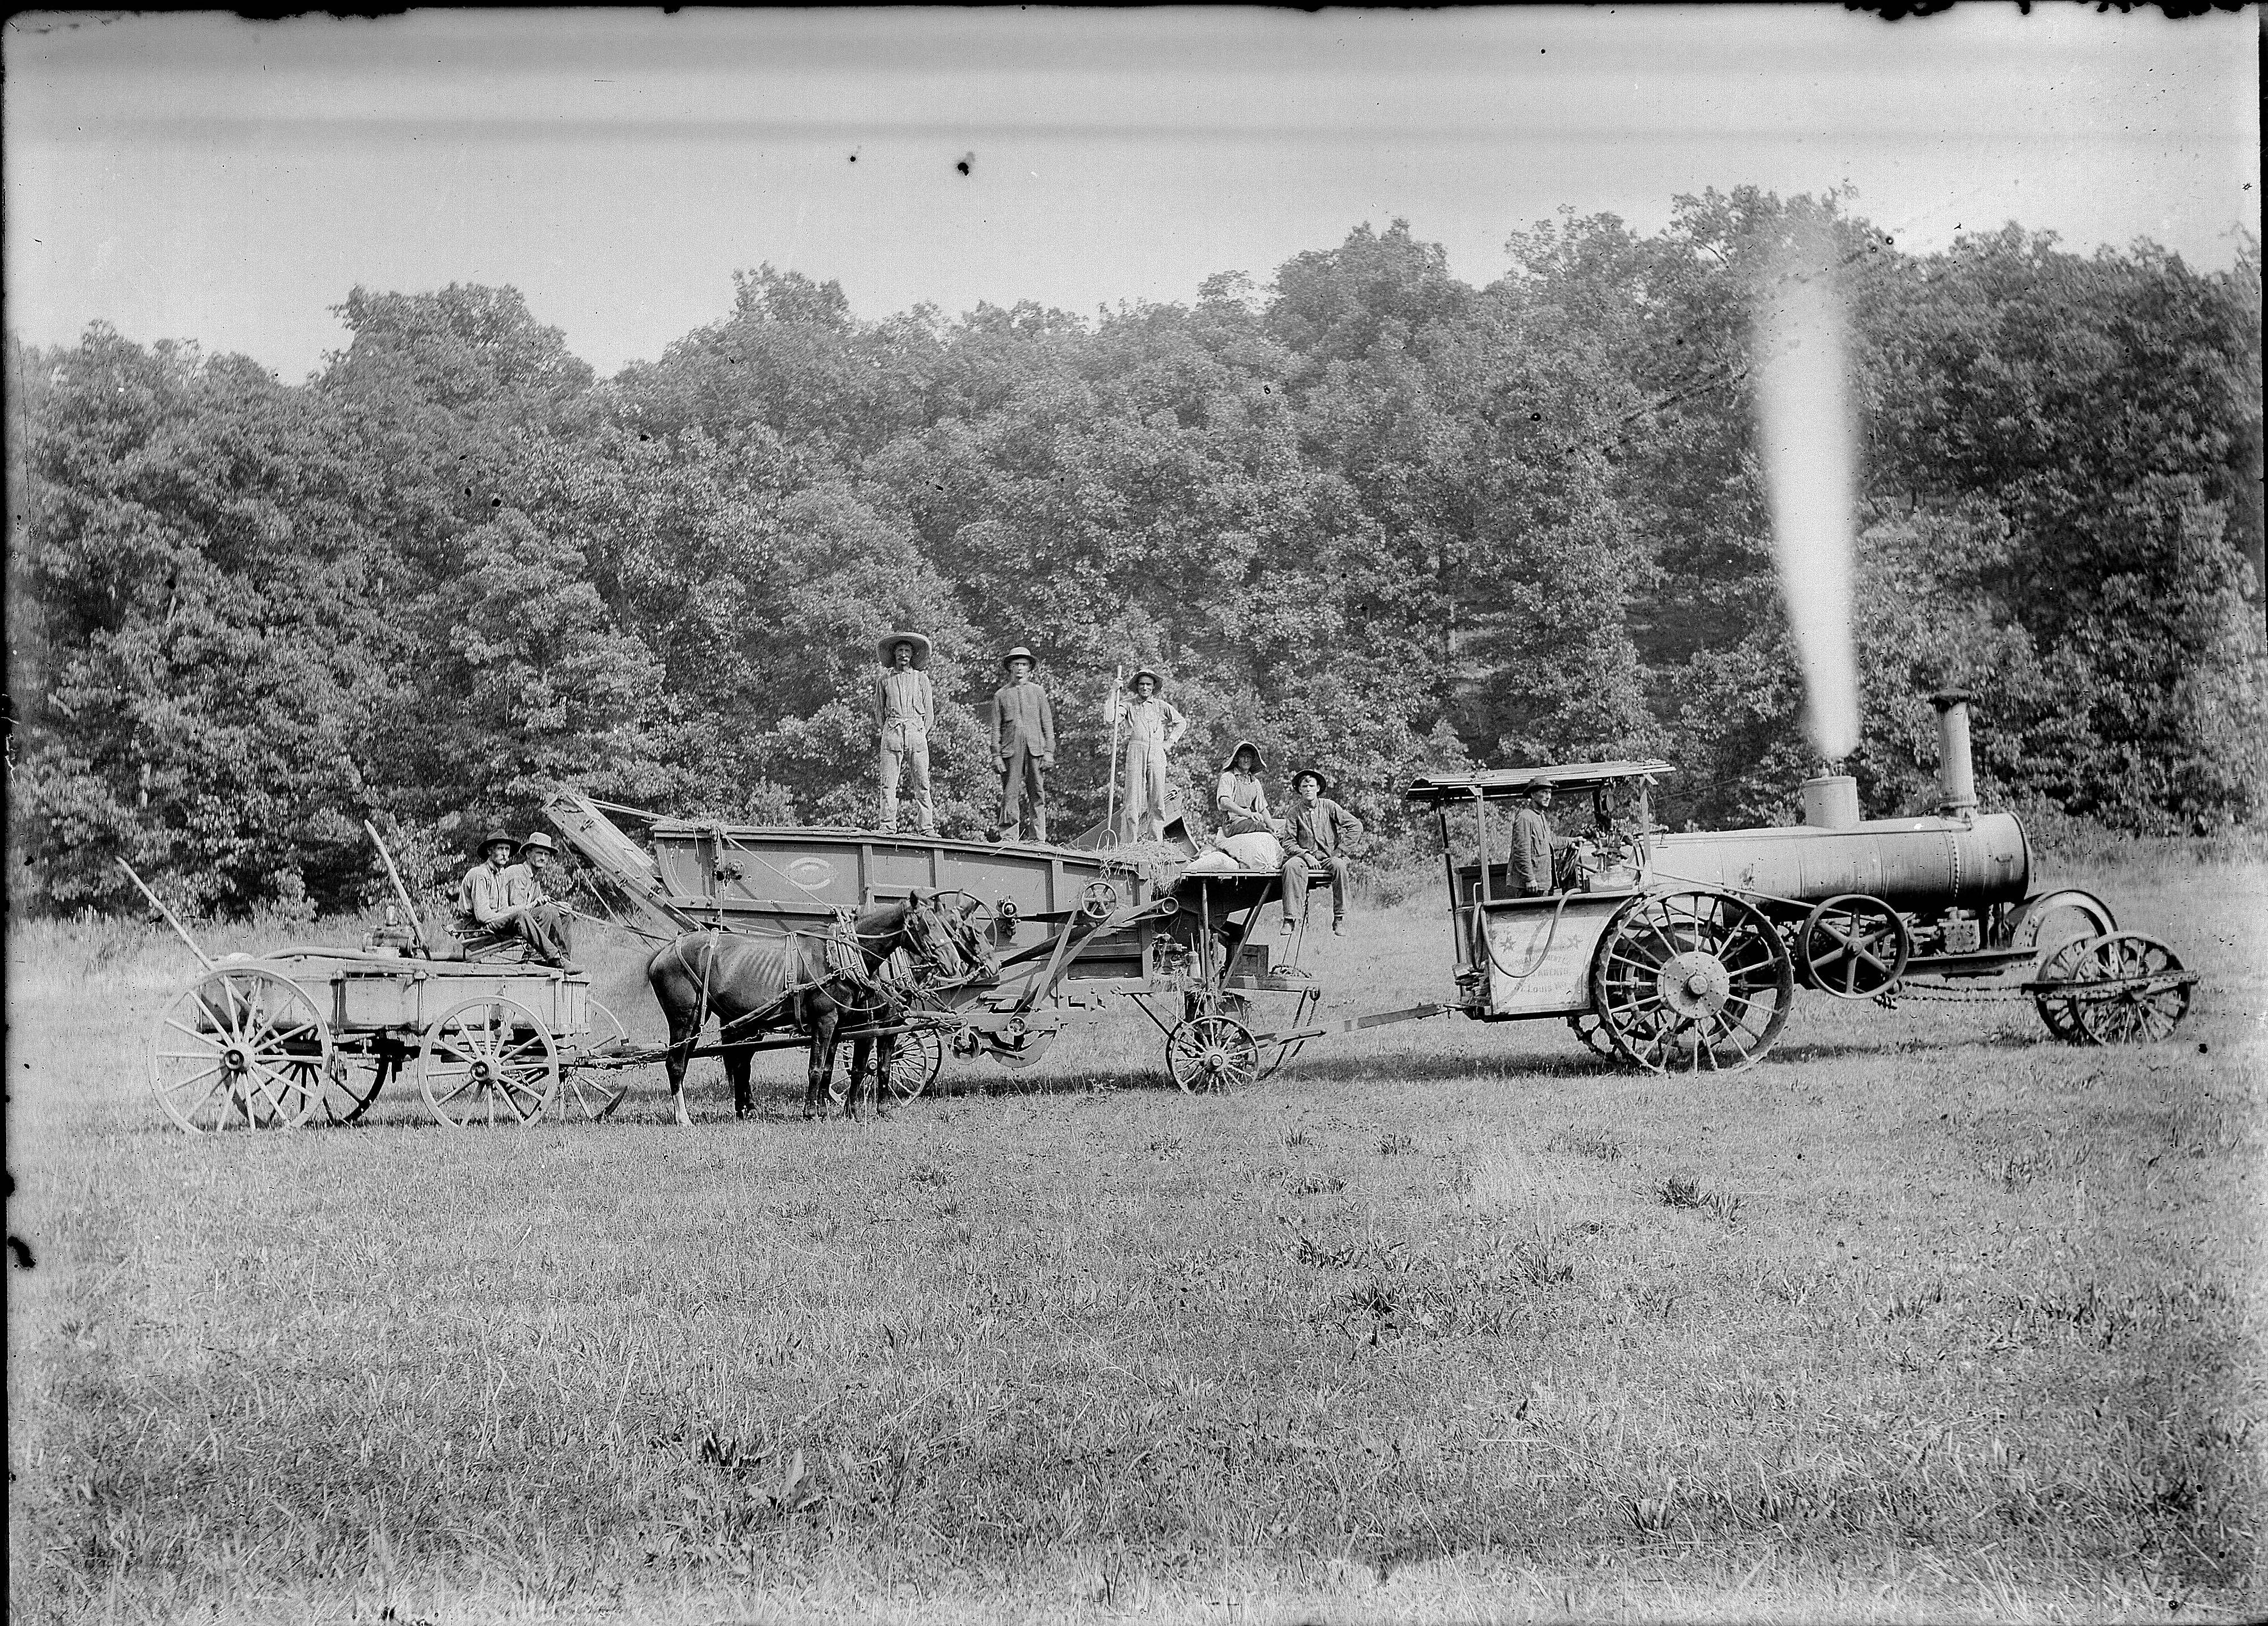 Farm Crew With Steam Tractor Hay Baler And Wagon Photographer Gill Charles Elliott United States Missouri Dent County 1900 1920 Transporte Mulas